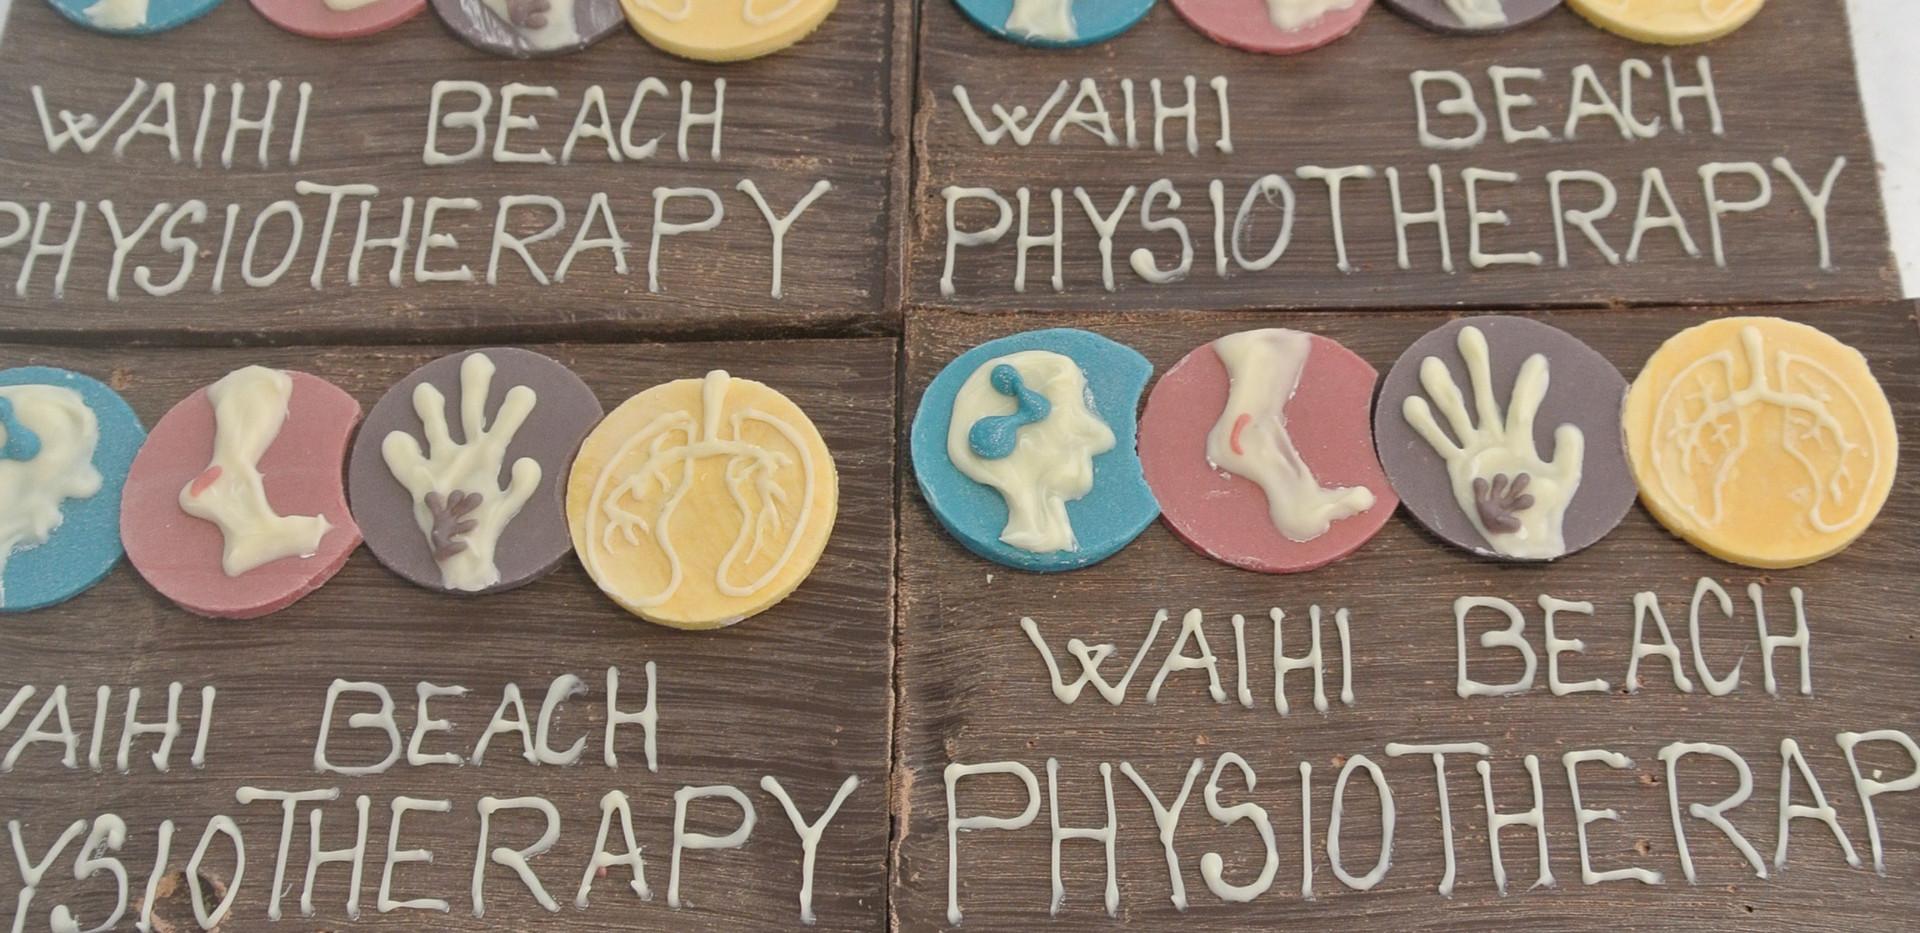 waihi beach physiotherapy